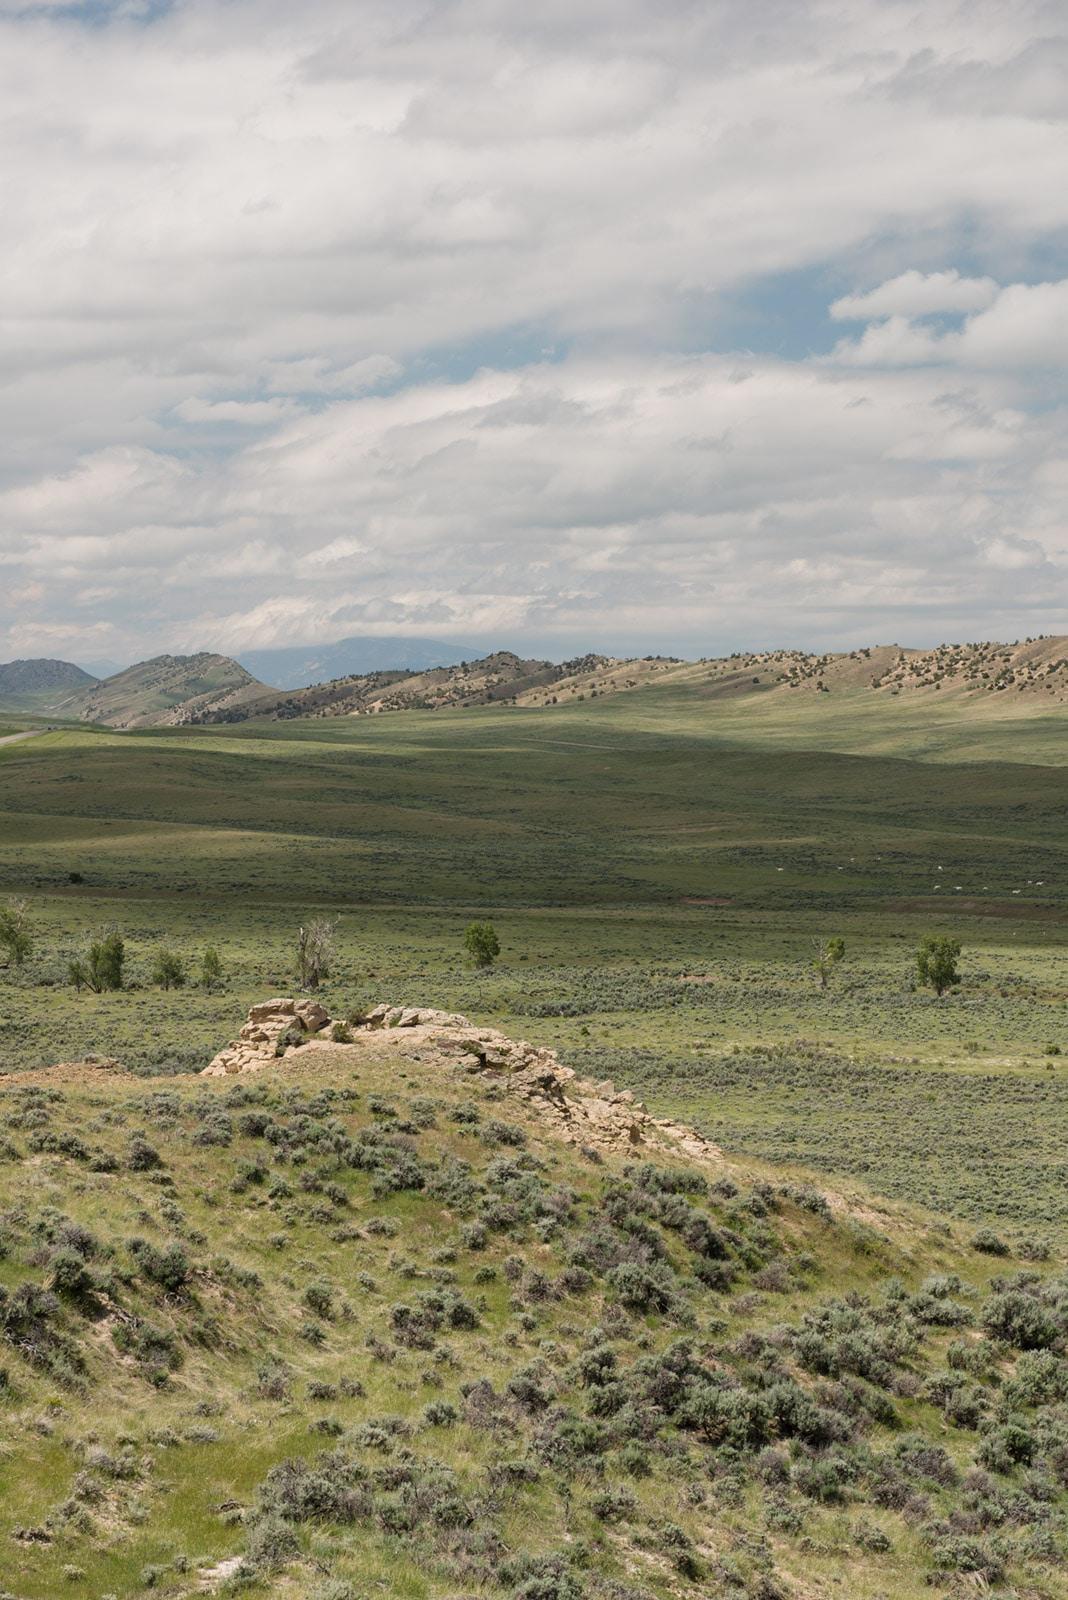 20150613 9334 - Onwards to Yellowstone